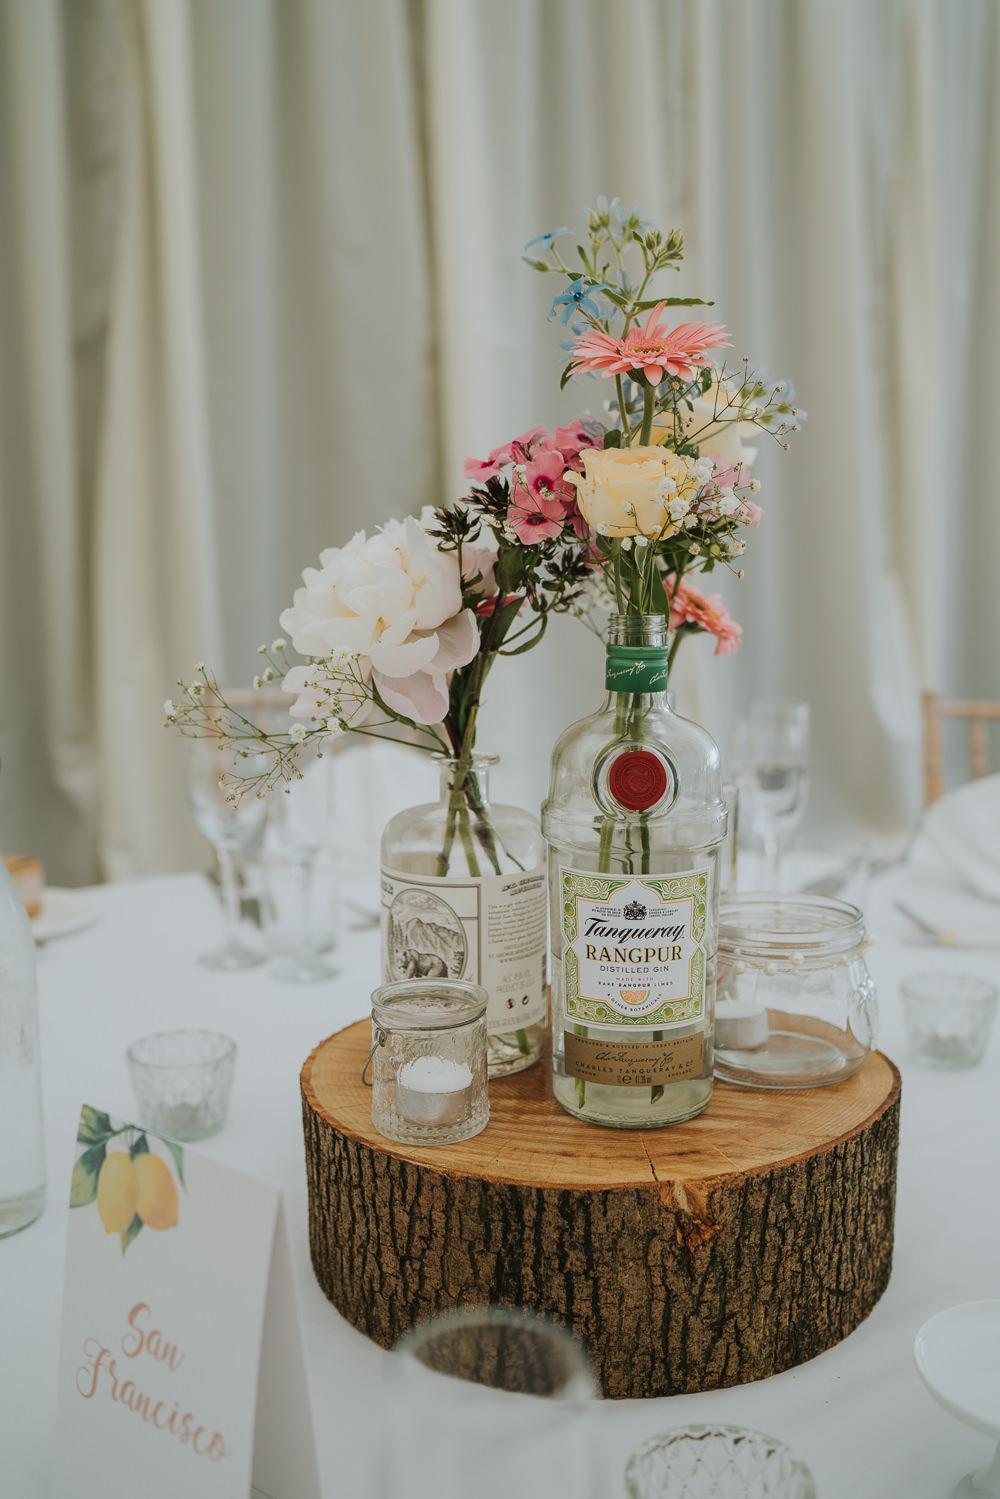 Centrepiece Decor Table Log Slice Bottle Flowers High House Weddings Grace Elizabeth Photography